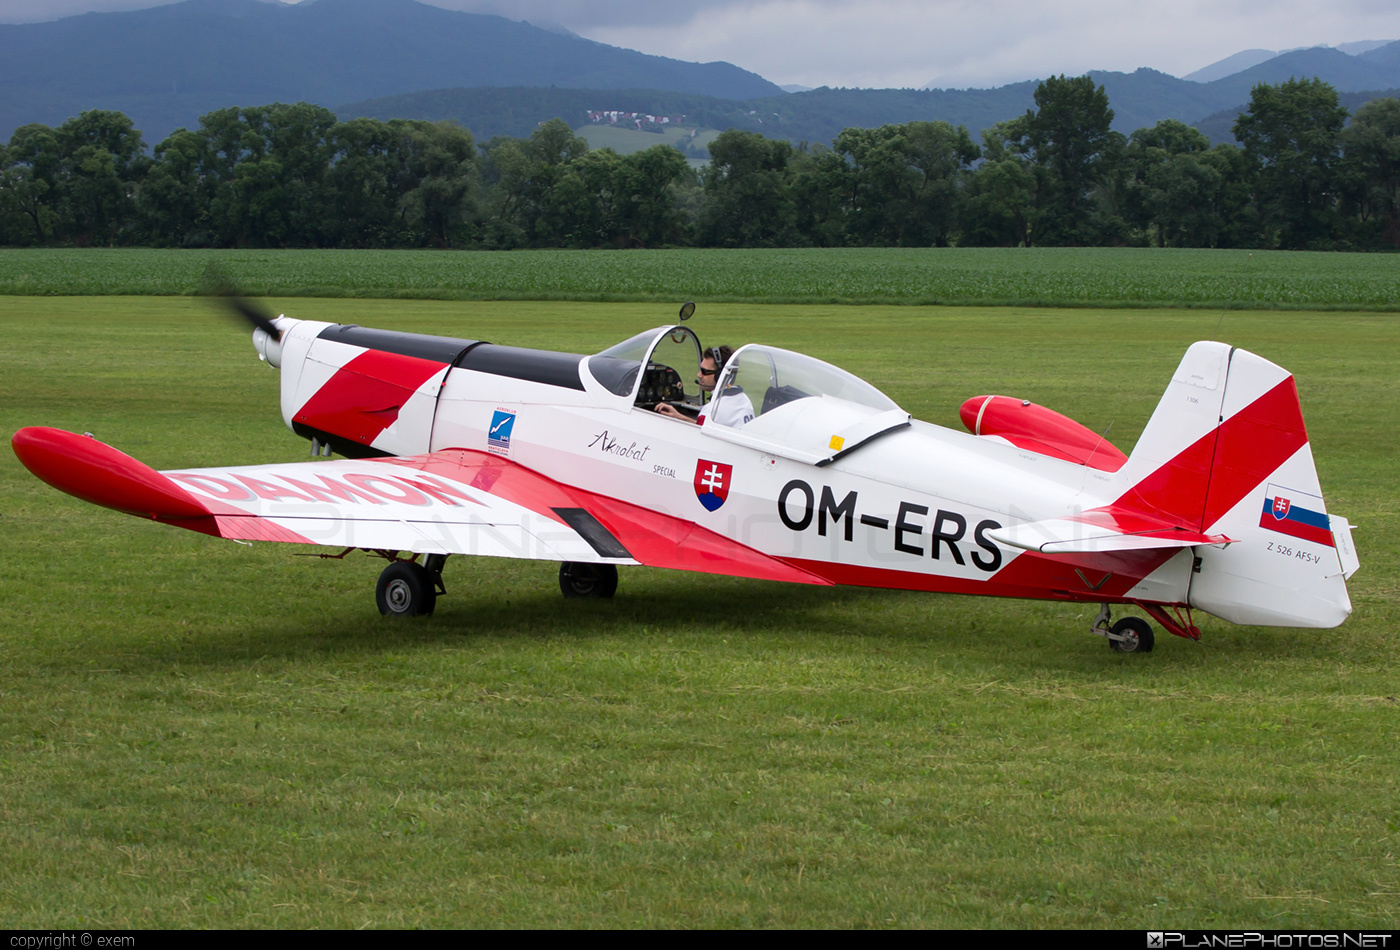 Aeroklub Bratislava Zlin Z-526AFS-V Akrobat Speciál - OM-ERS #akrobatspecial #kratas #z526 #z526akrobatspecial #zlin #zlin526